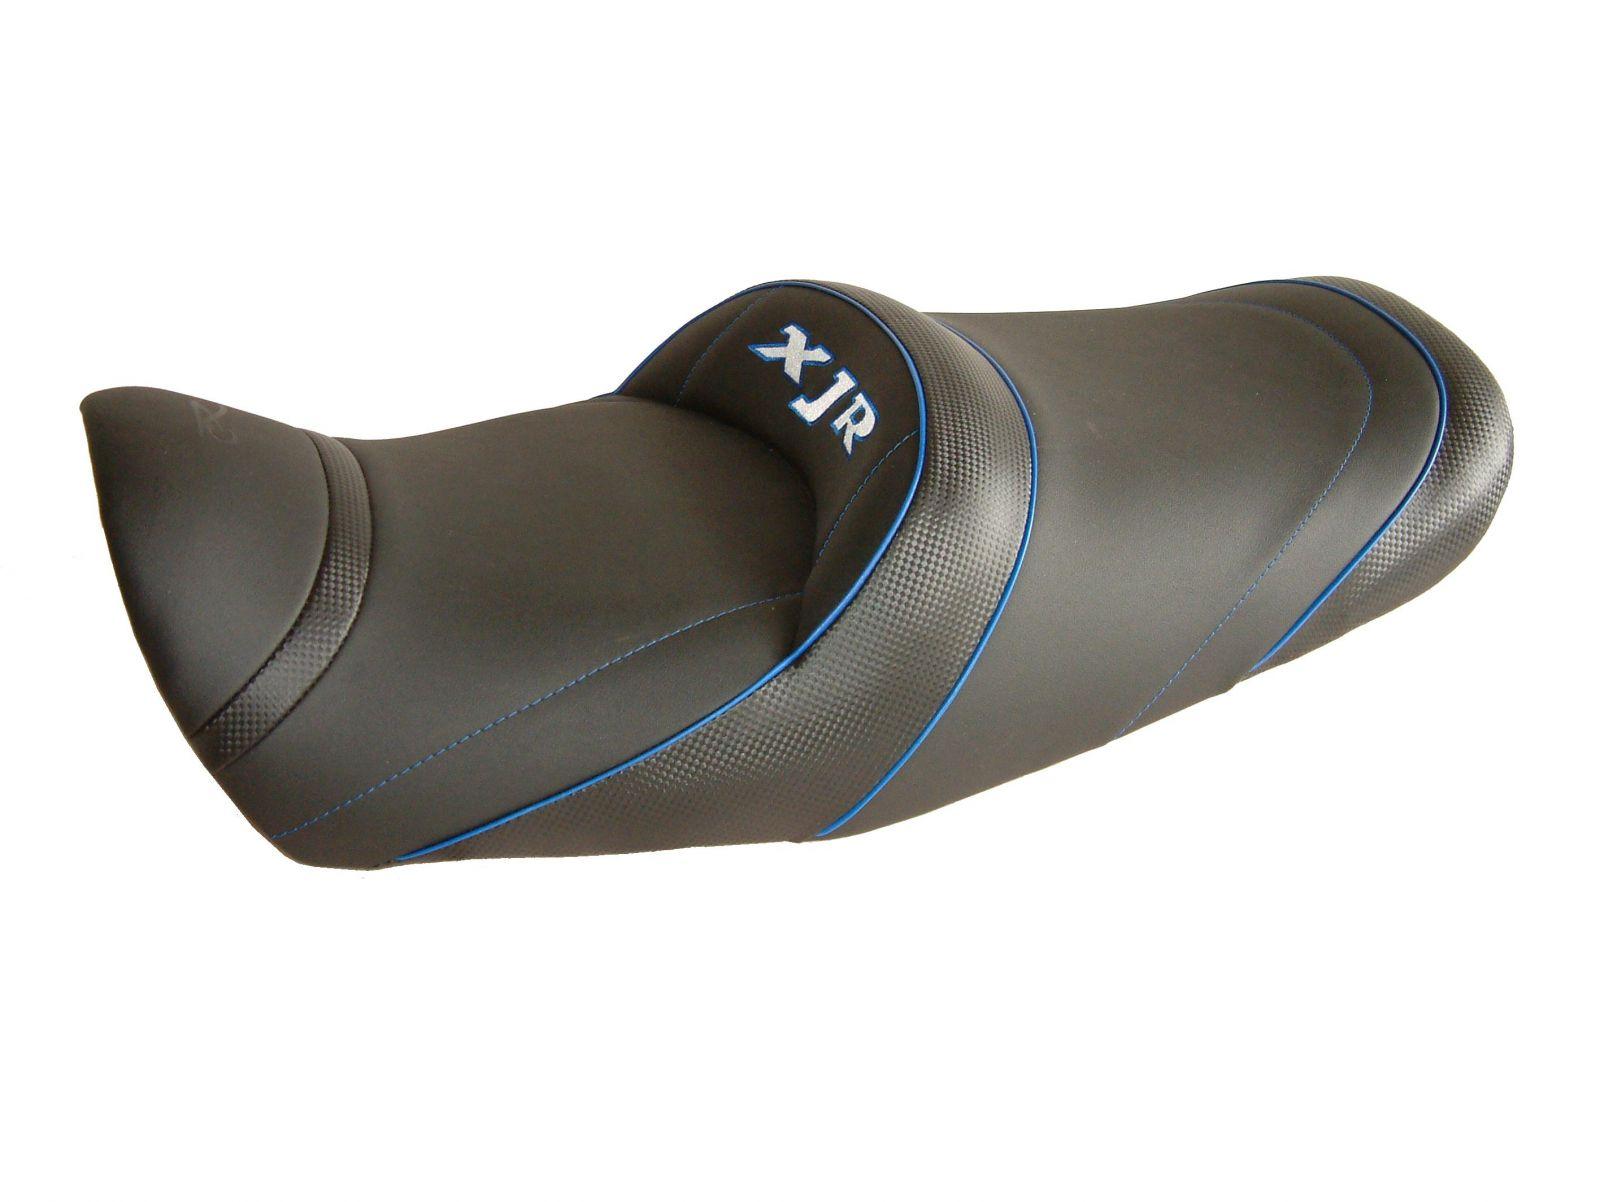 Sella Grande Confort SGC0917 - YAMAHA XJR 1300 [2002-2014]